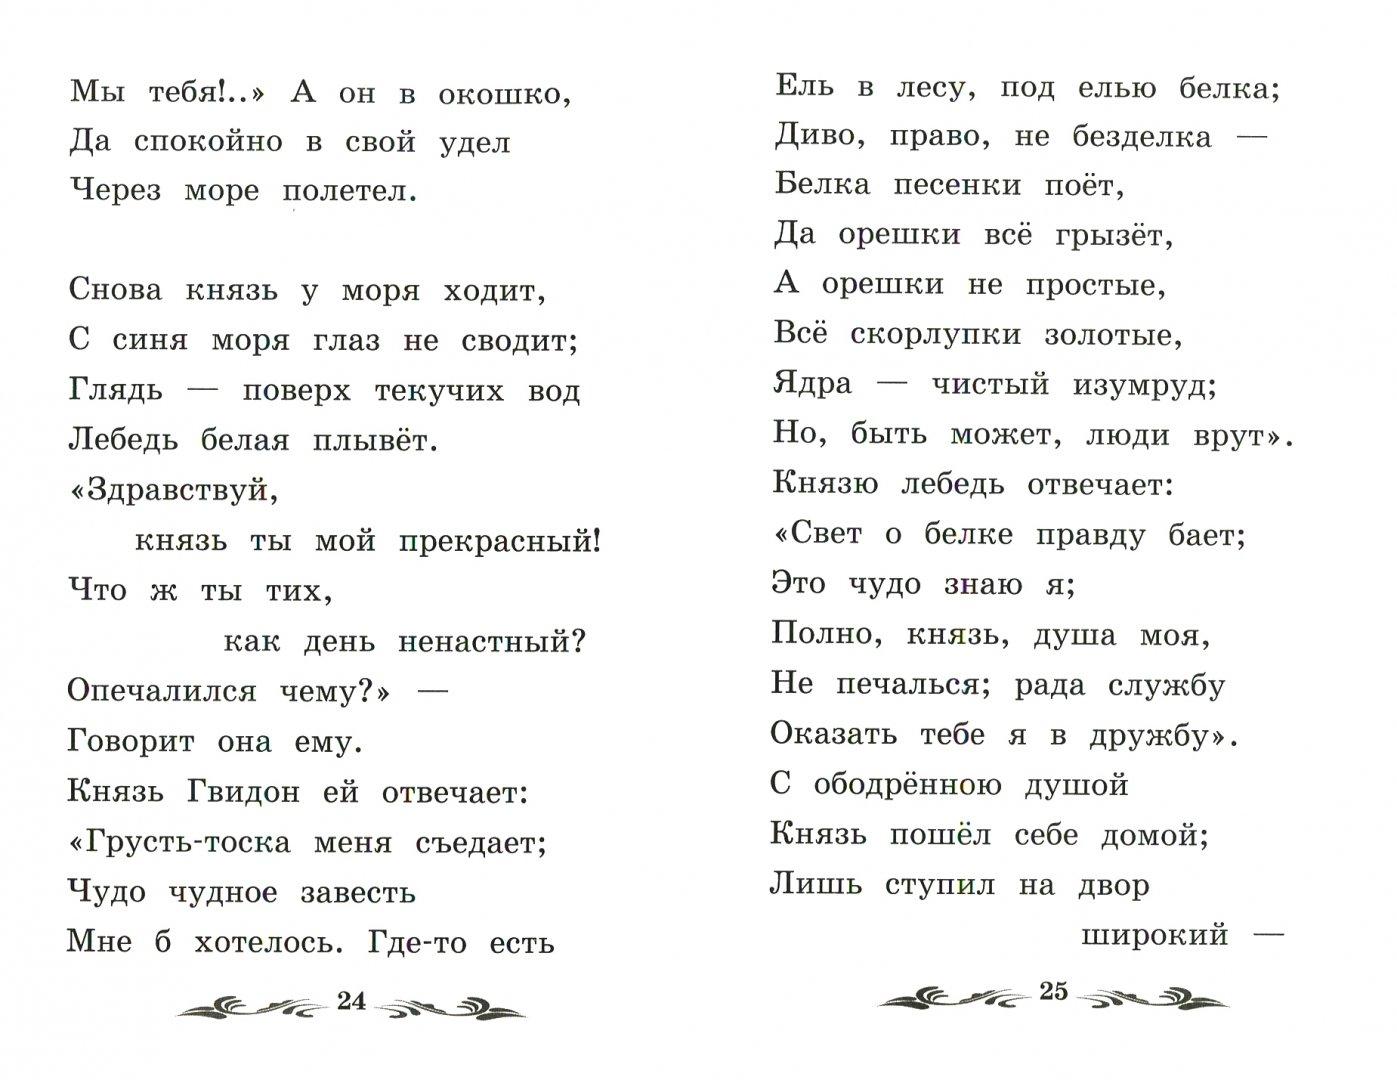 Иллюстрация 1 из 6 для Сказка о царе Салтане - Александр Пушкин   Лабиринт - книги. Источник: Лабиринт